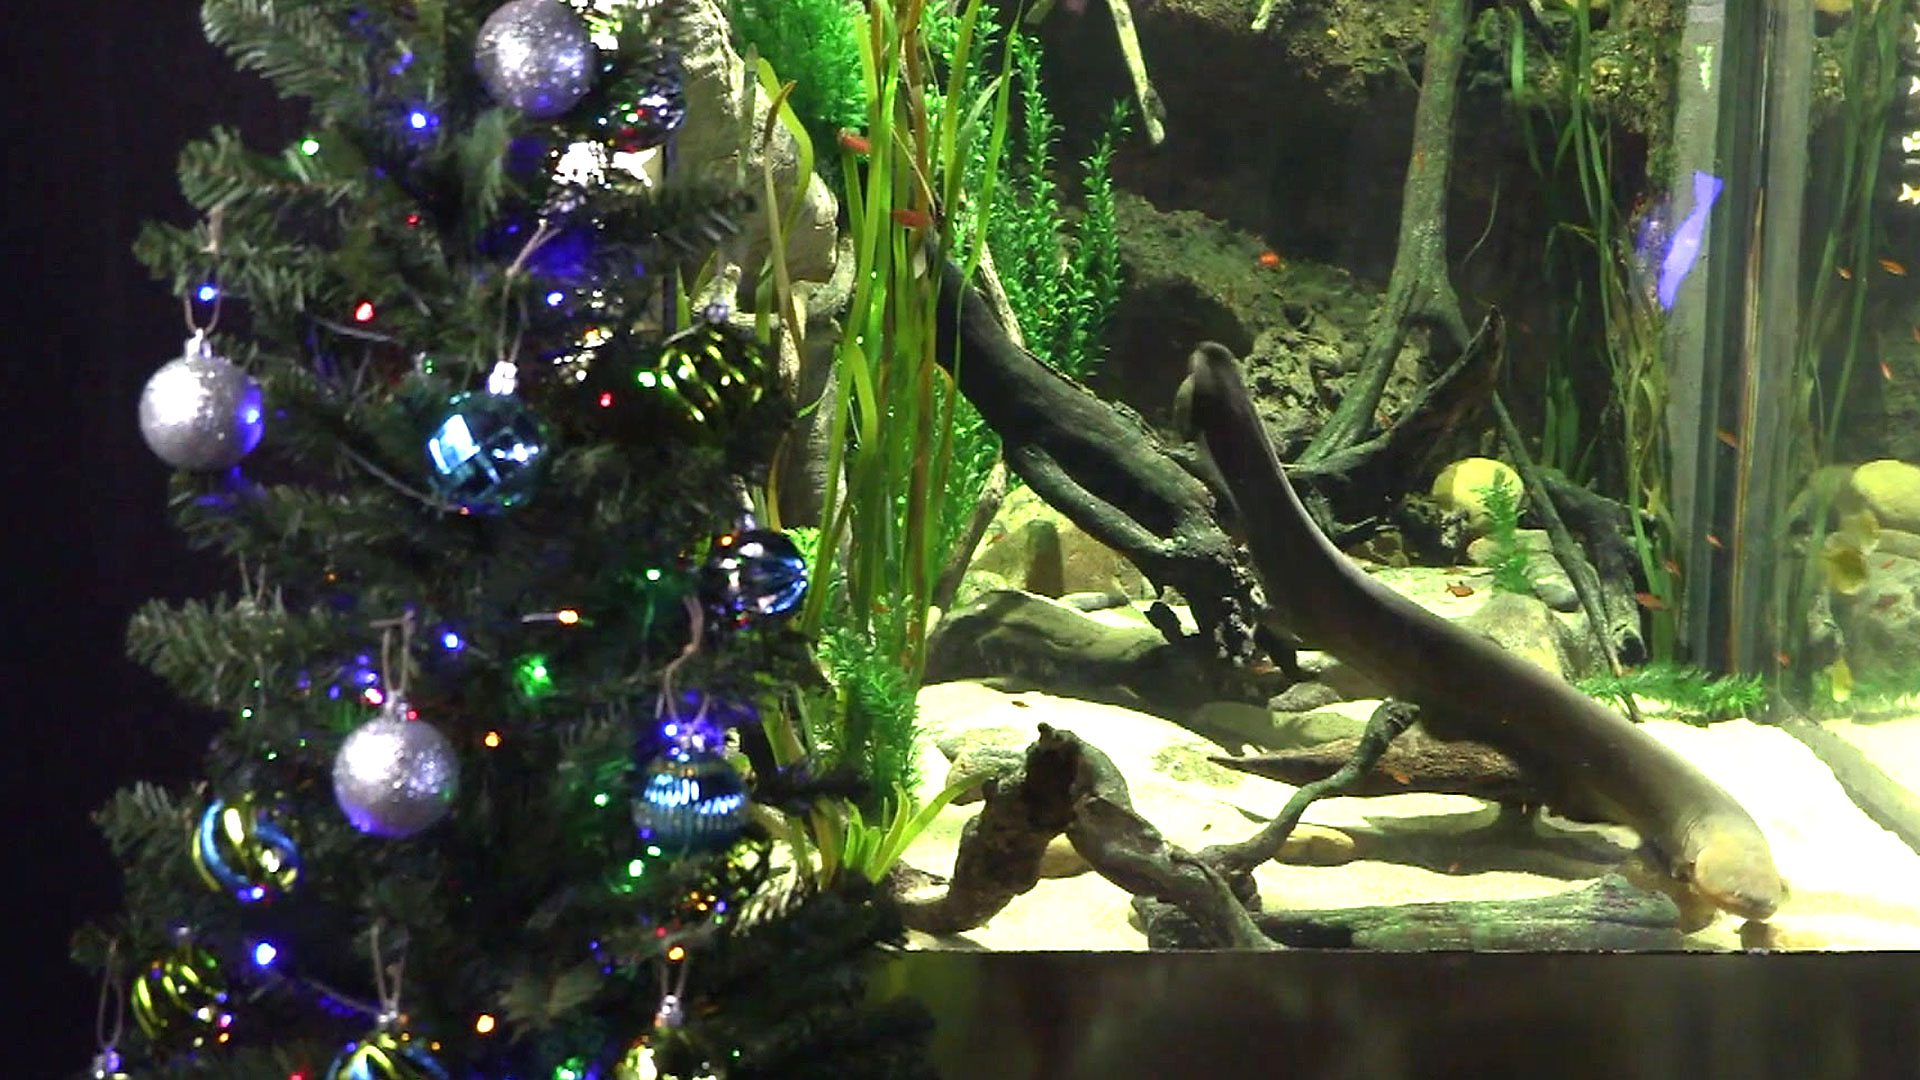 Electric Eel Lights Up Christmas Tree And Other News Bbc News